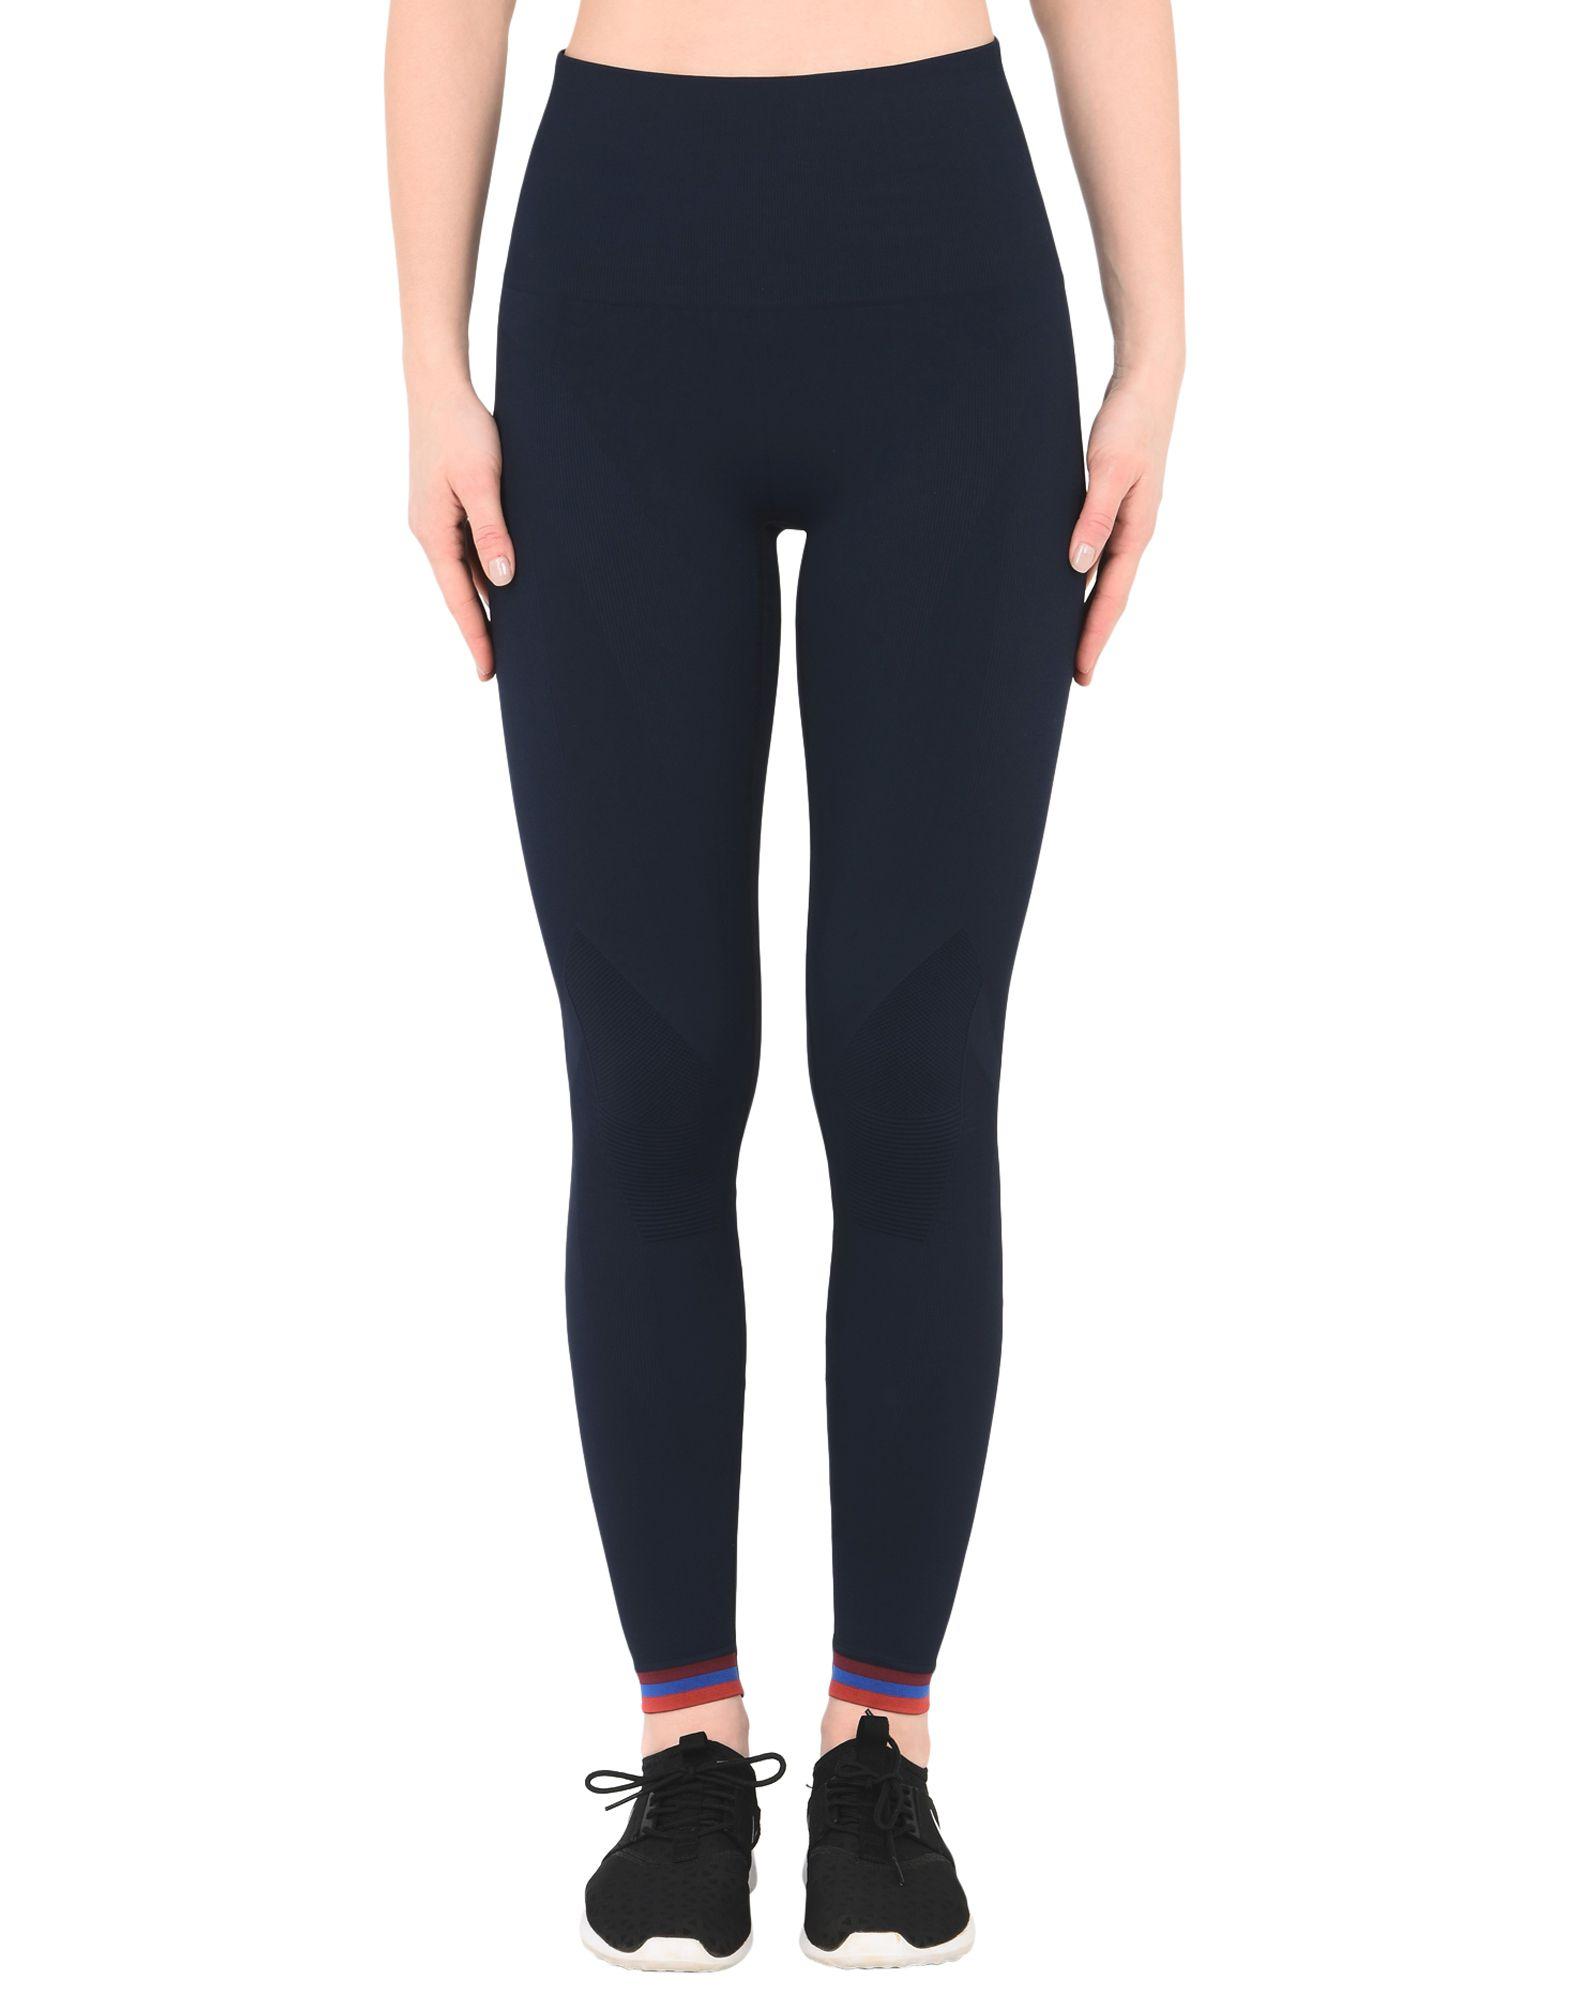 Leggings Lndr Frefall Legging - Donna - Acquista online su